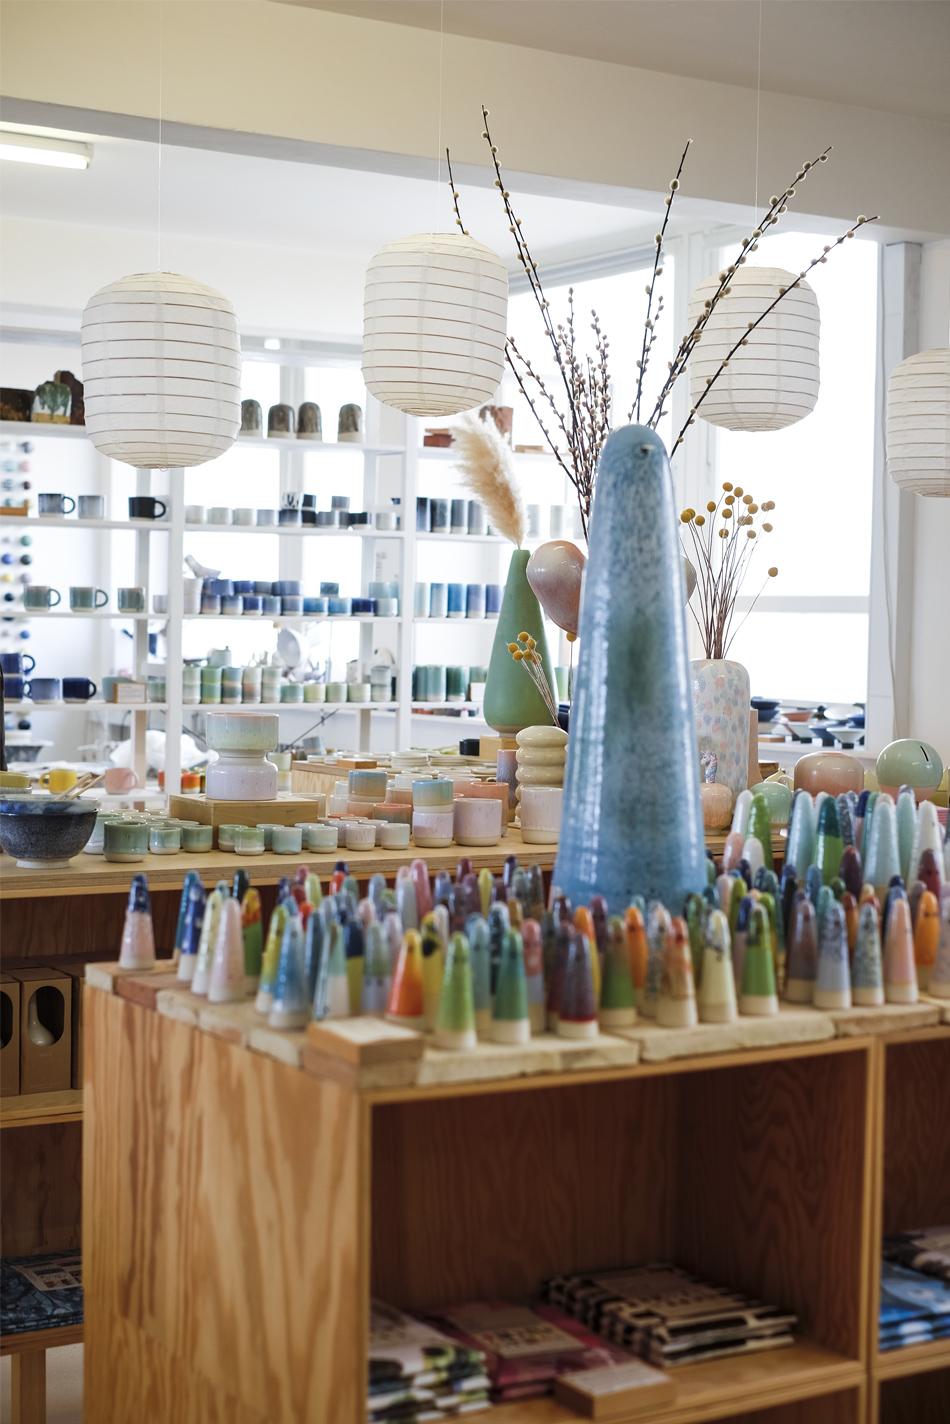 showroom and workshop of ceramics